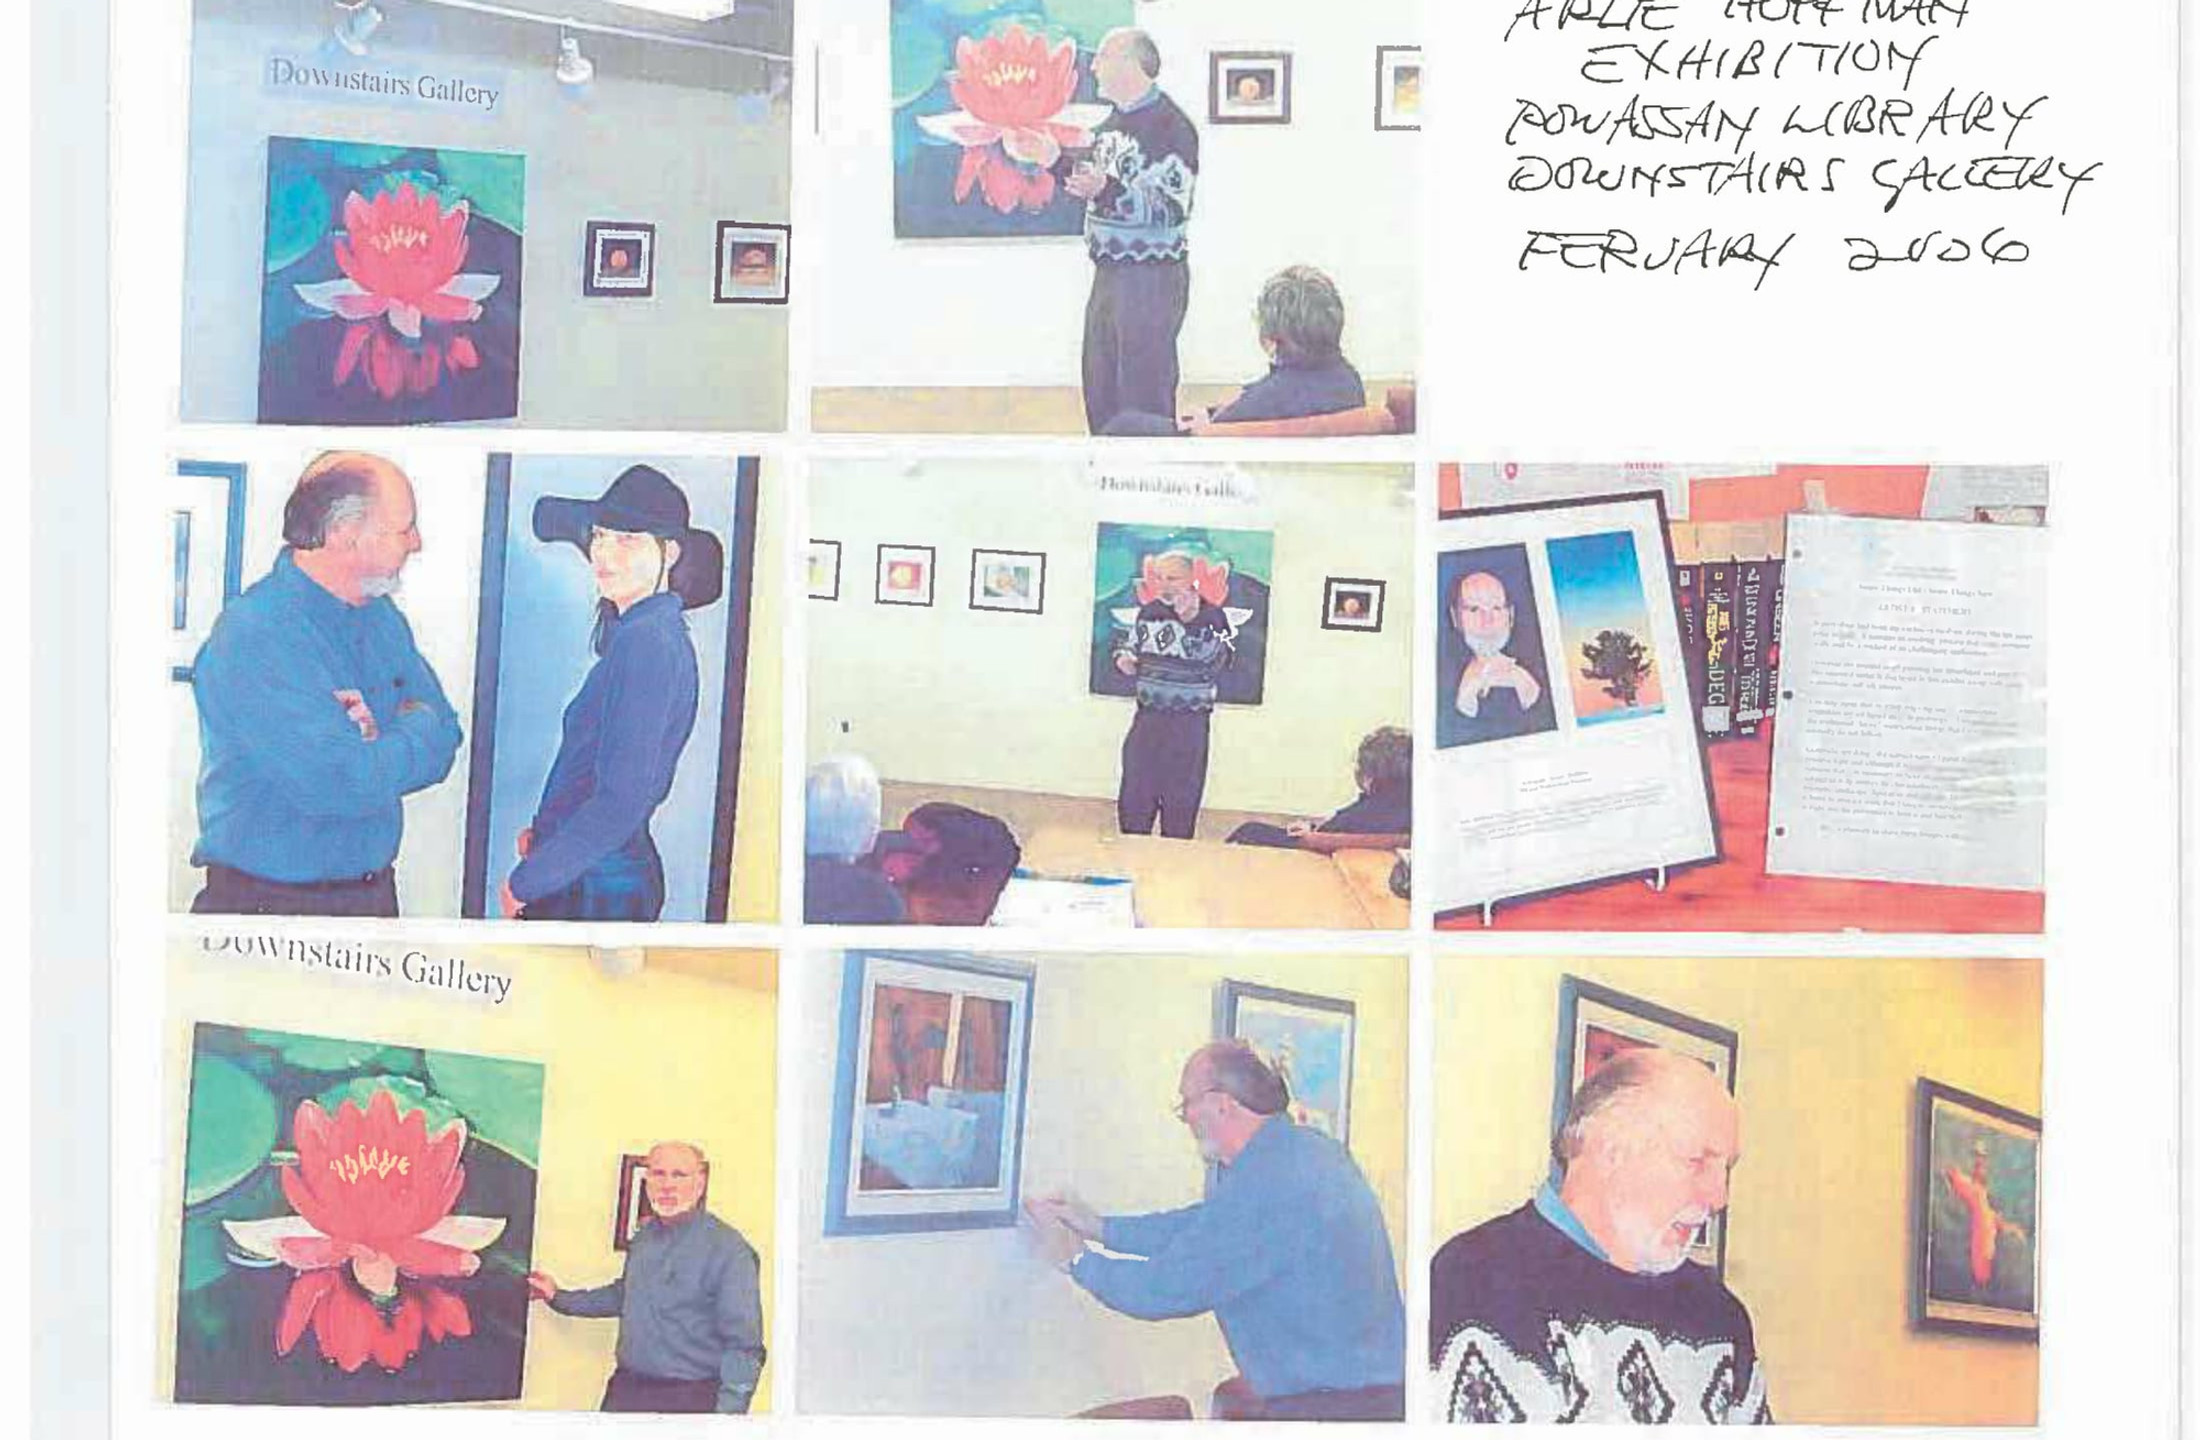 February 2006 - Arlie Hoffman - Art-1